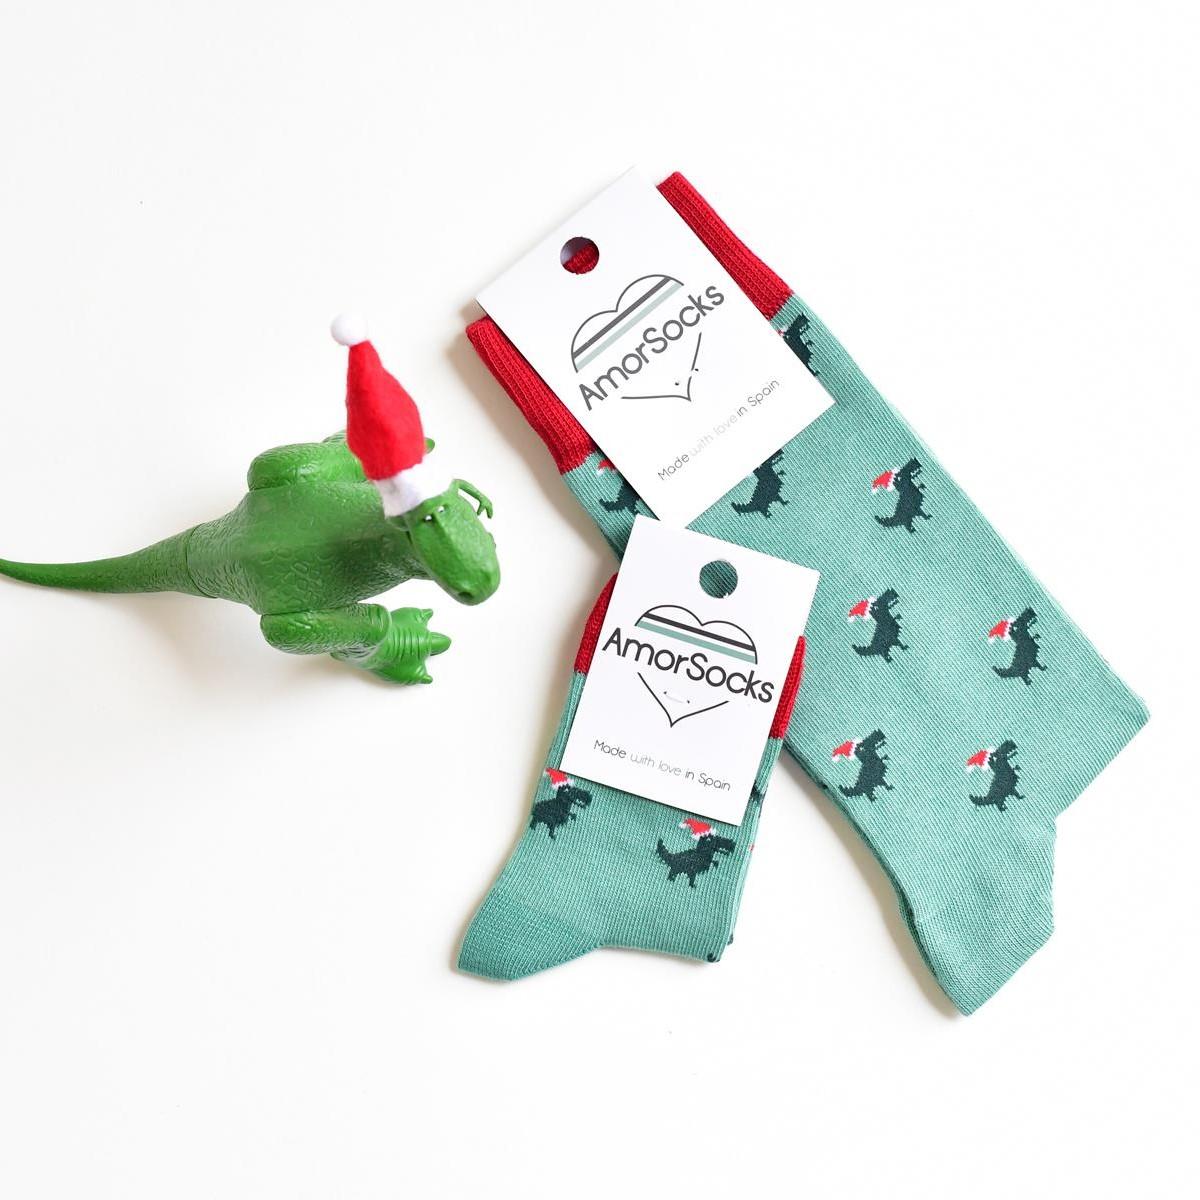 amorsocks-calcetines-socks-dinos-noel-navidad-christmas-dinosaurios-trex-tiranoraurio-verde-rojo-green-red-niños-niñas-kids-papa-noel-colección